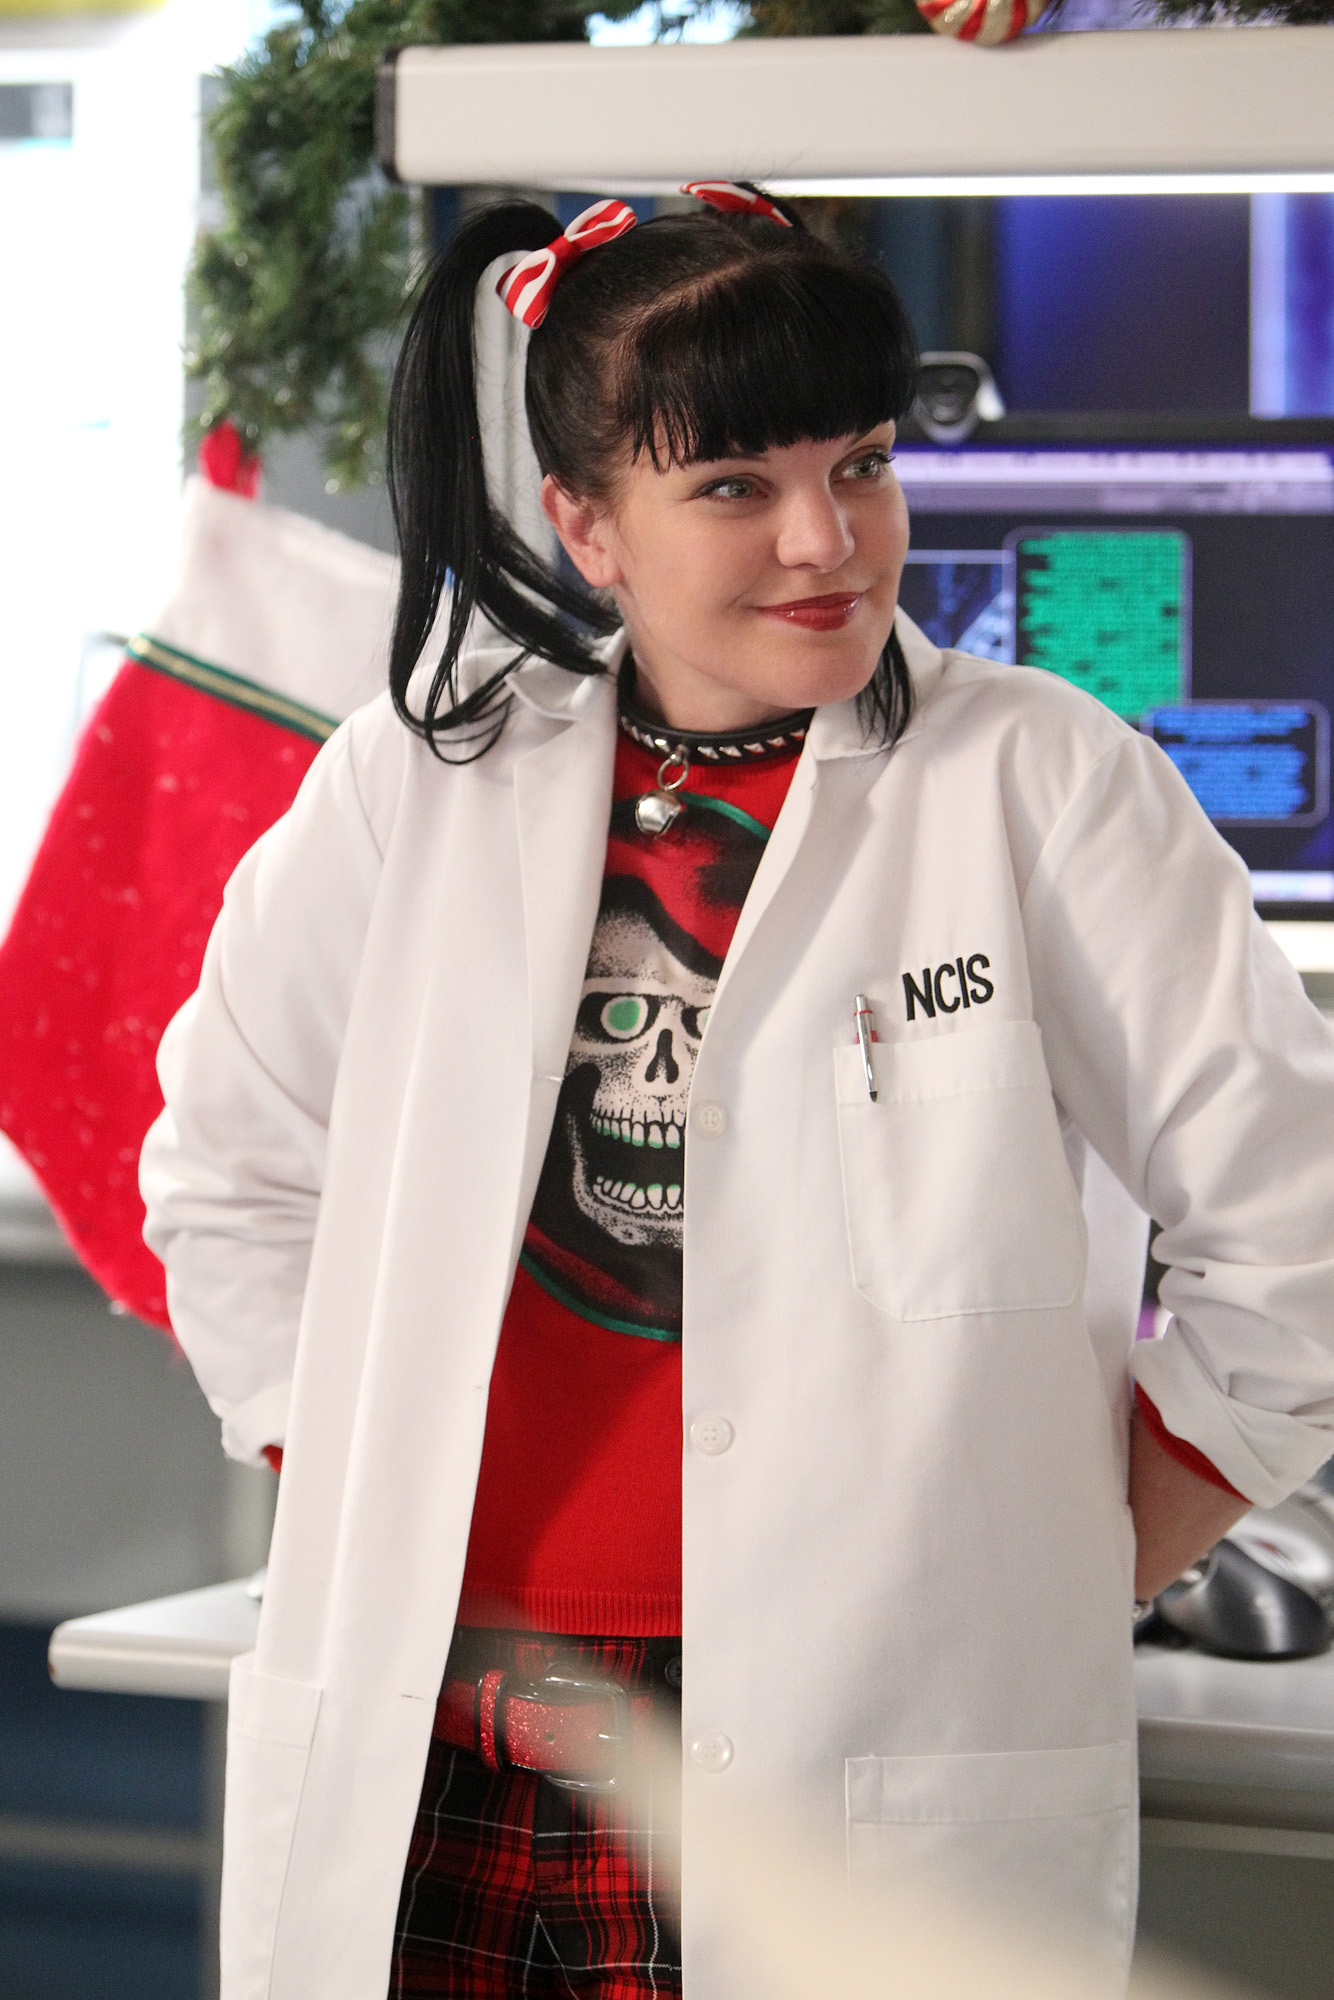 NCIS Christmas Episode